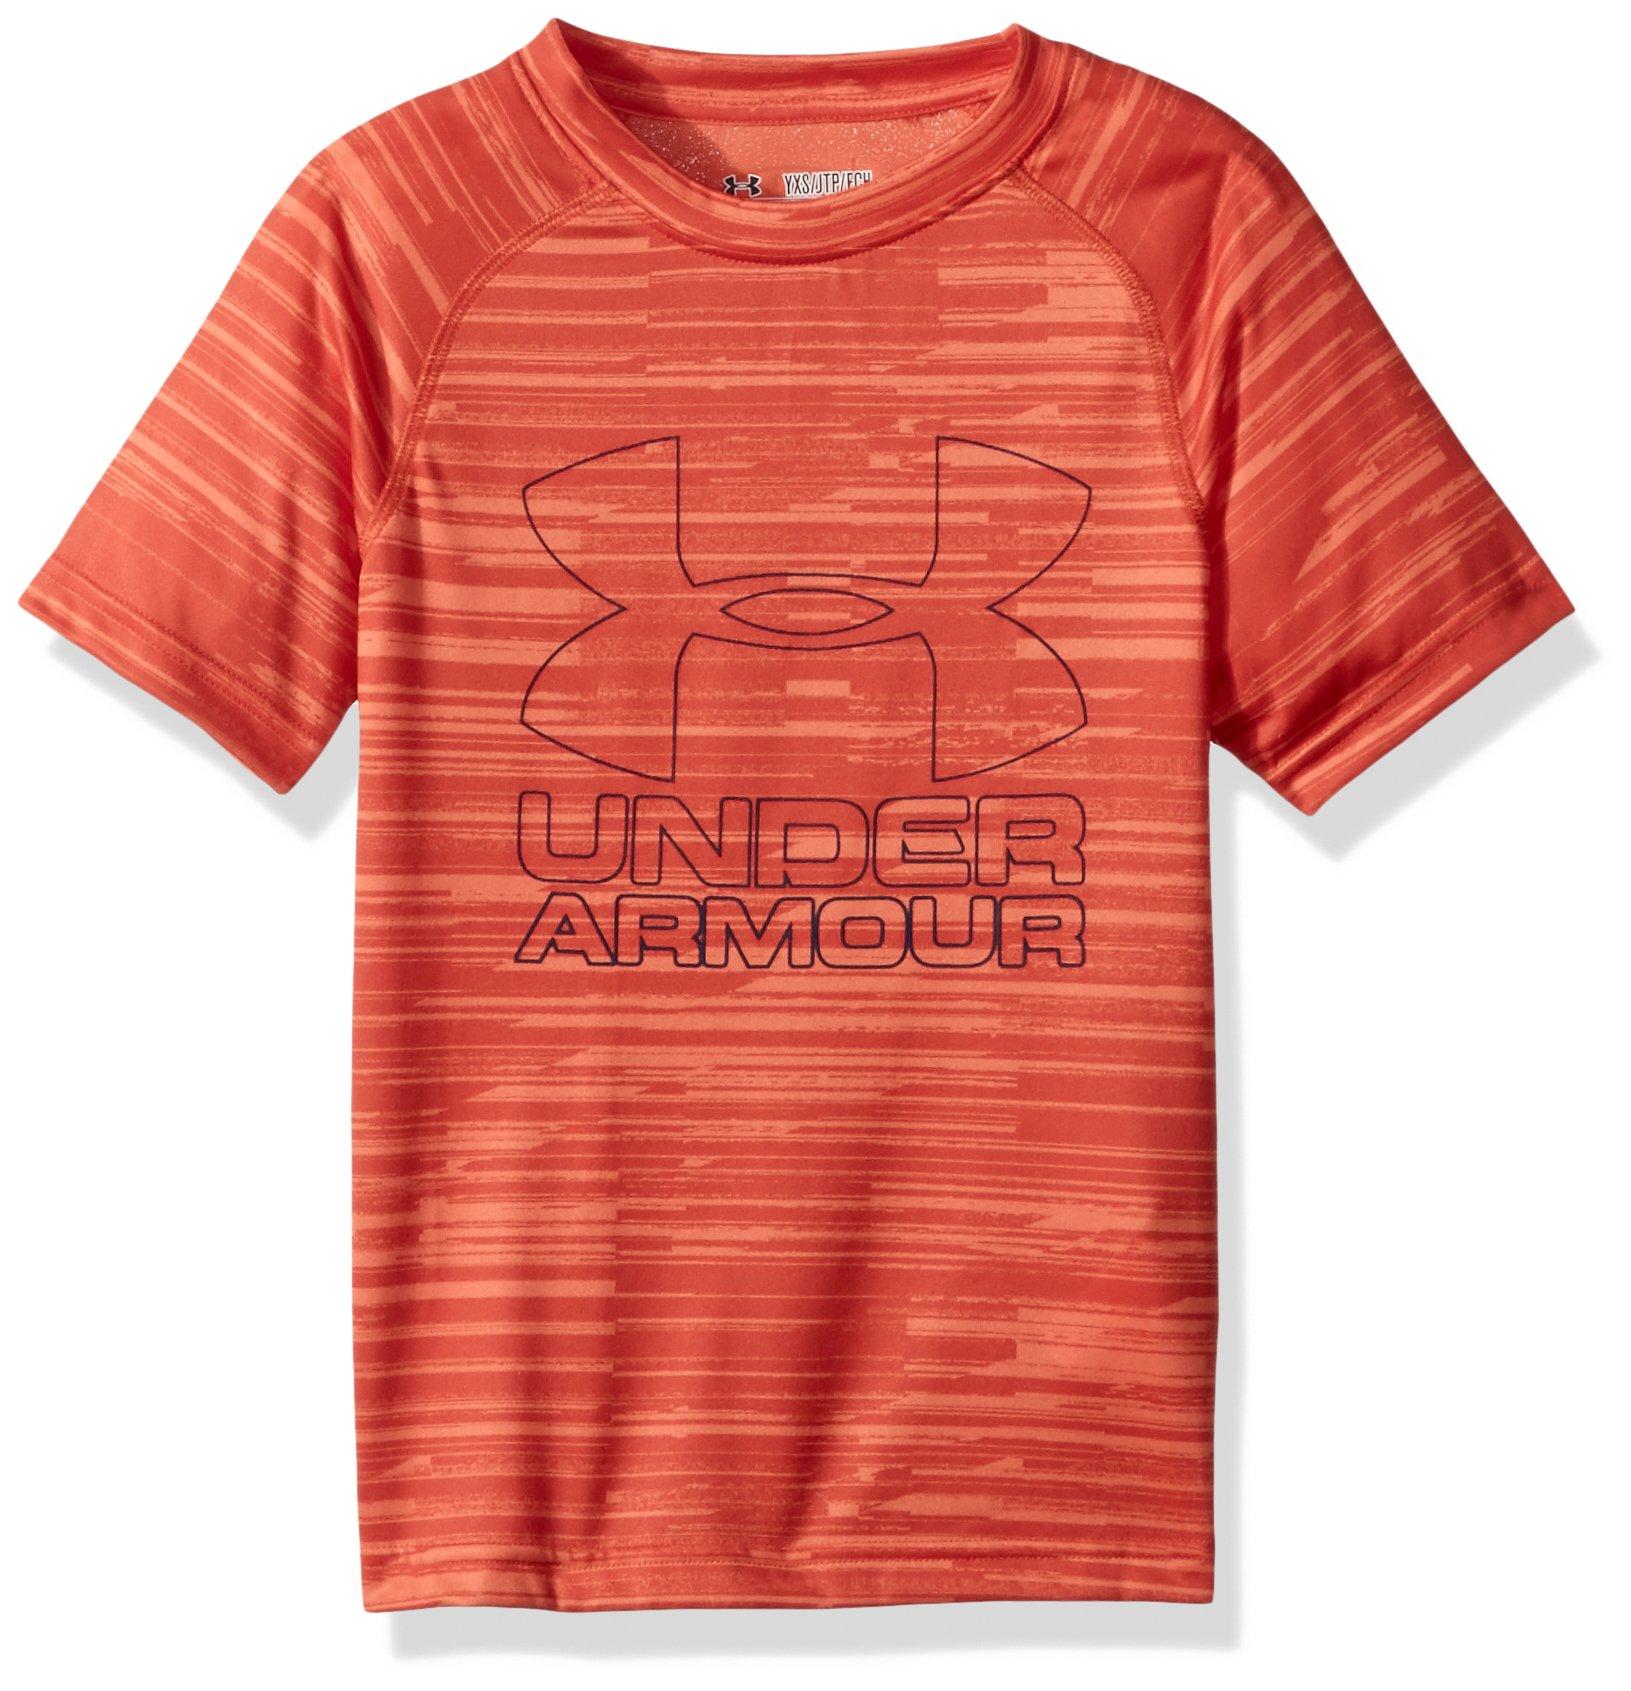 Under Armour Boys Big Logo Printed T-Shirt,Dark Orange /Blackout Navy, Youth X-Small